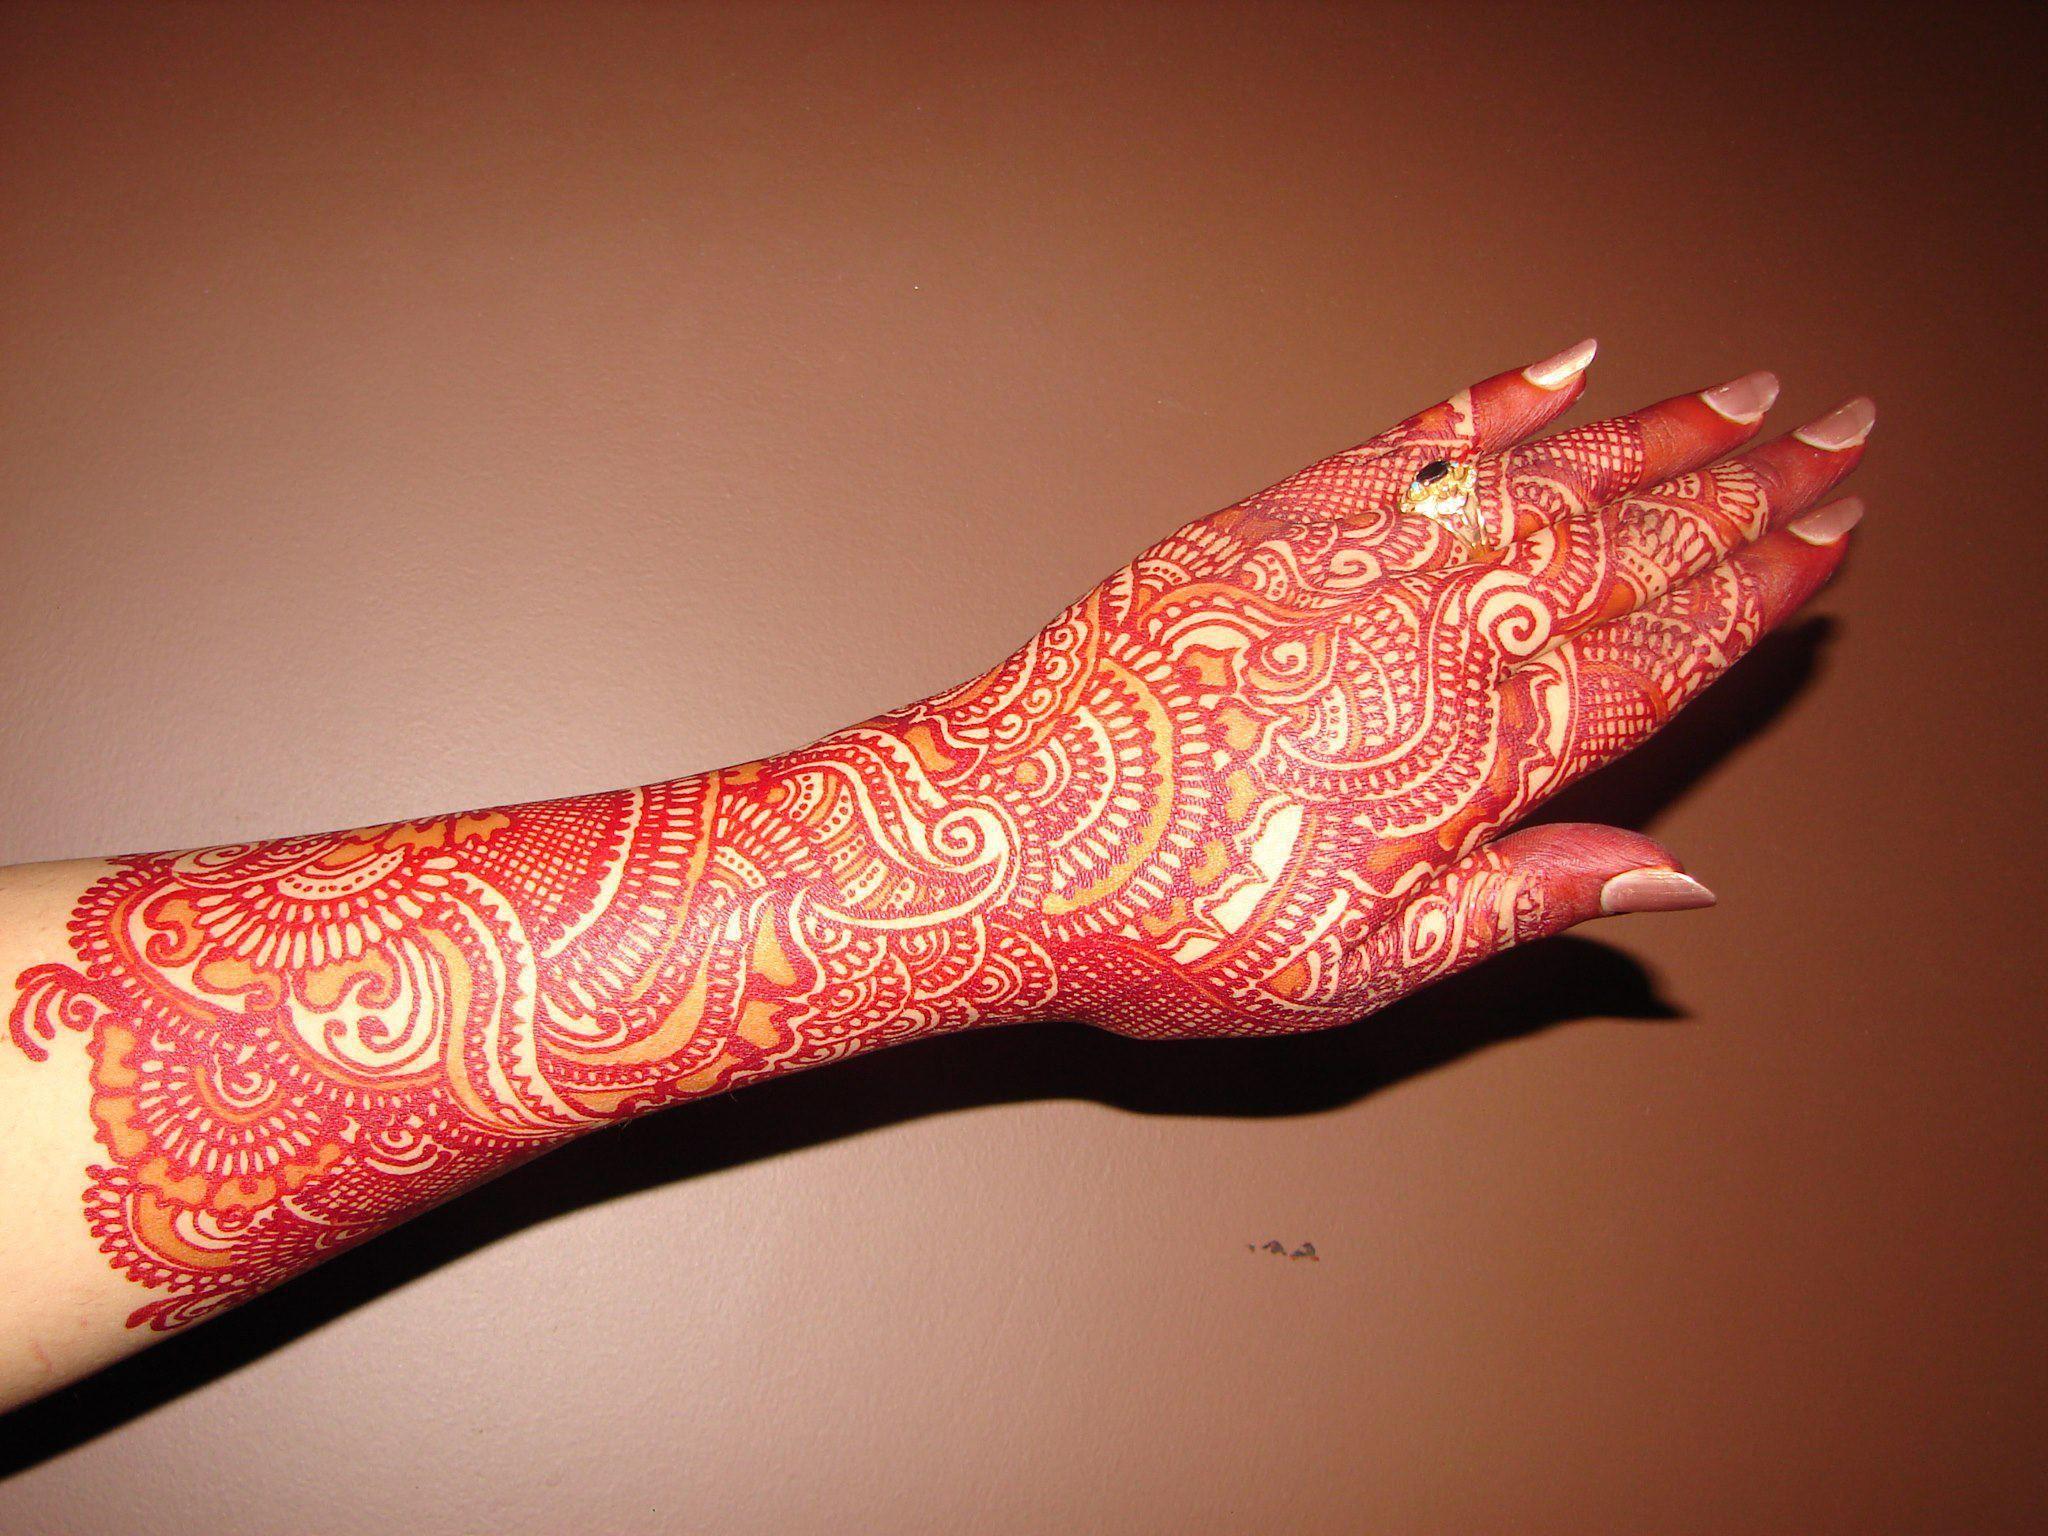 Rajasthani Bridal Mehndi Designs : Rajasthani bridal mehndi designs for full hands google search